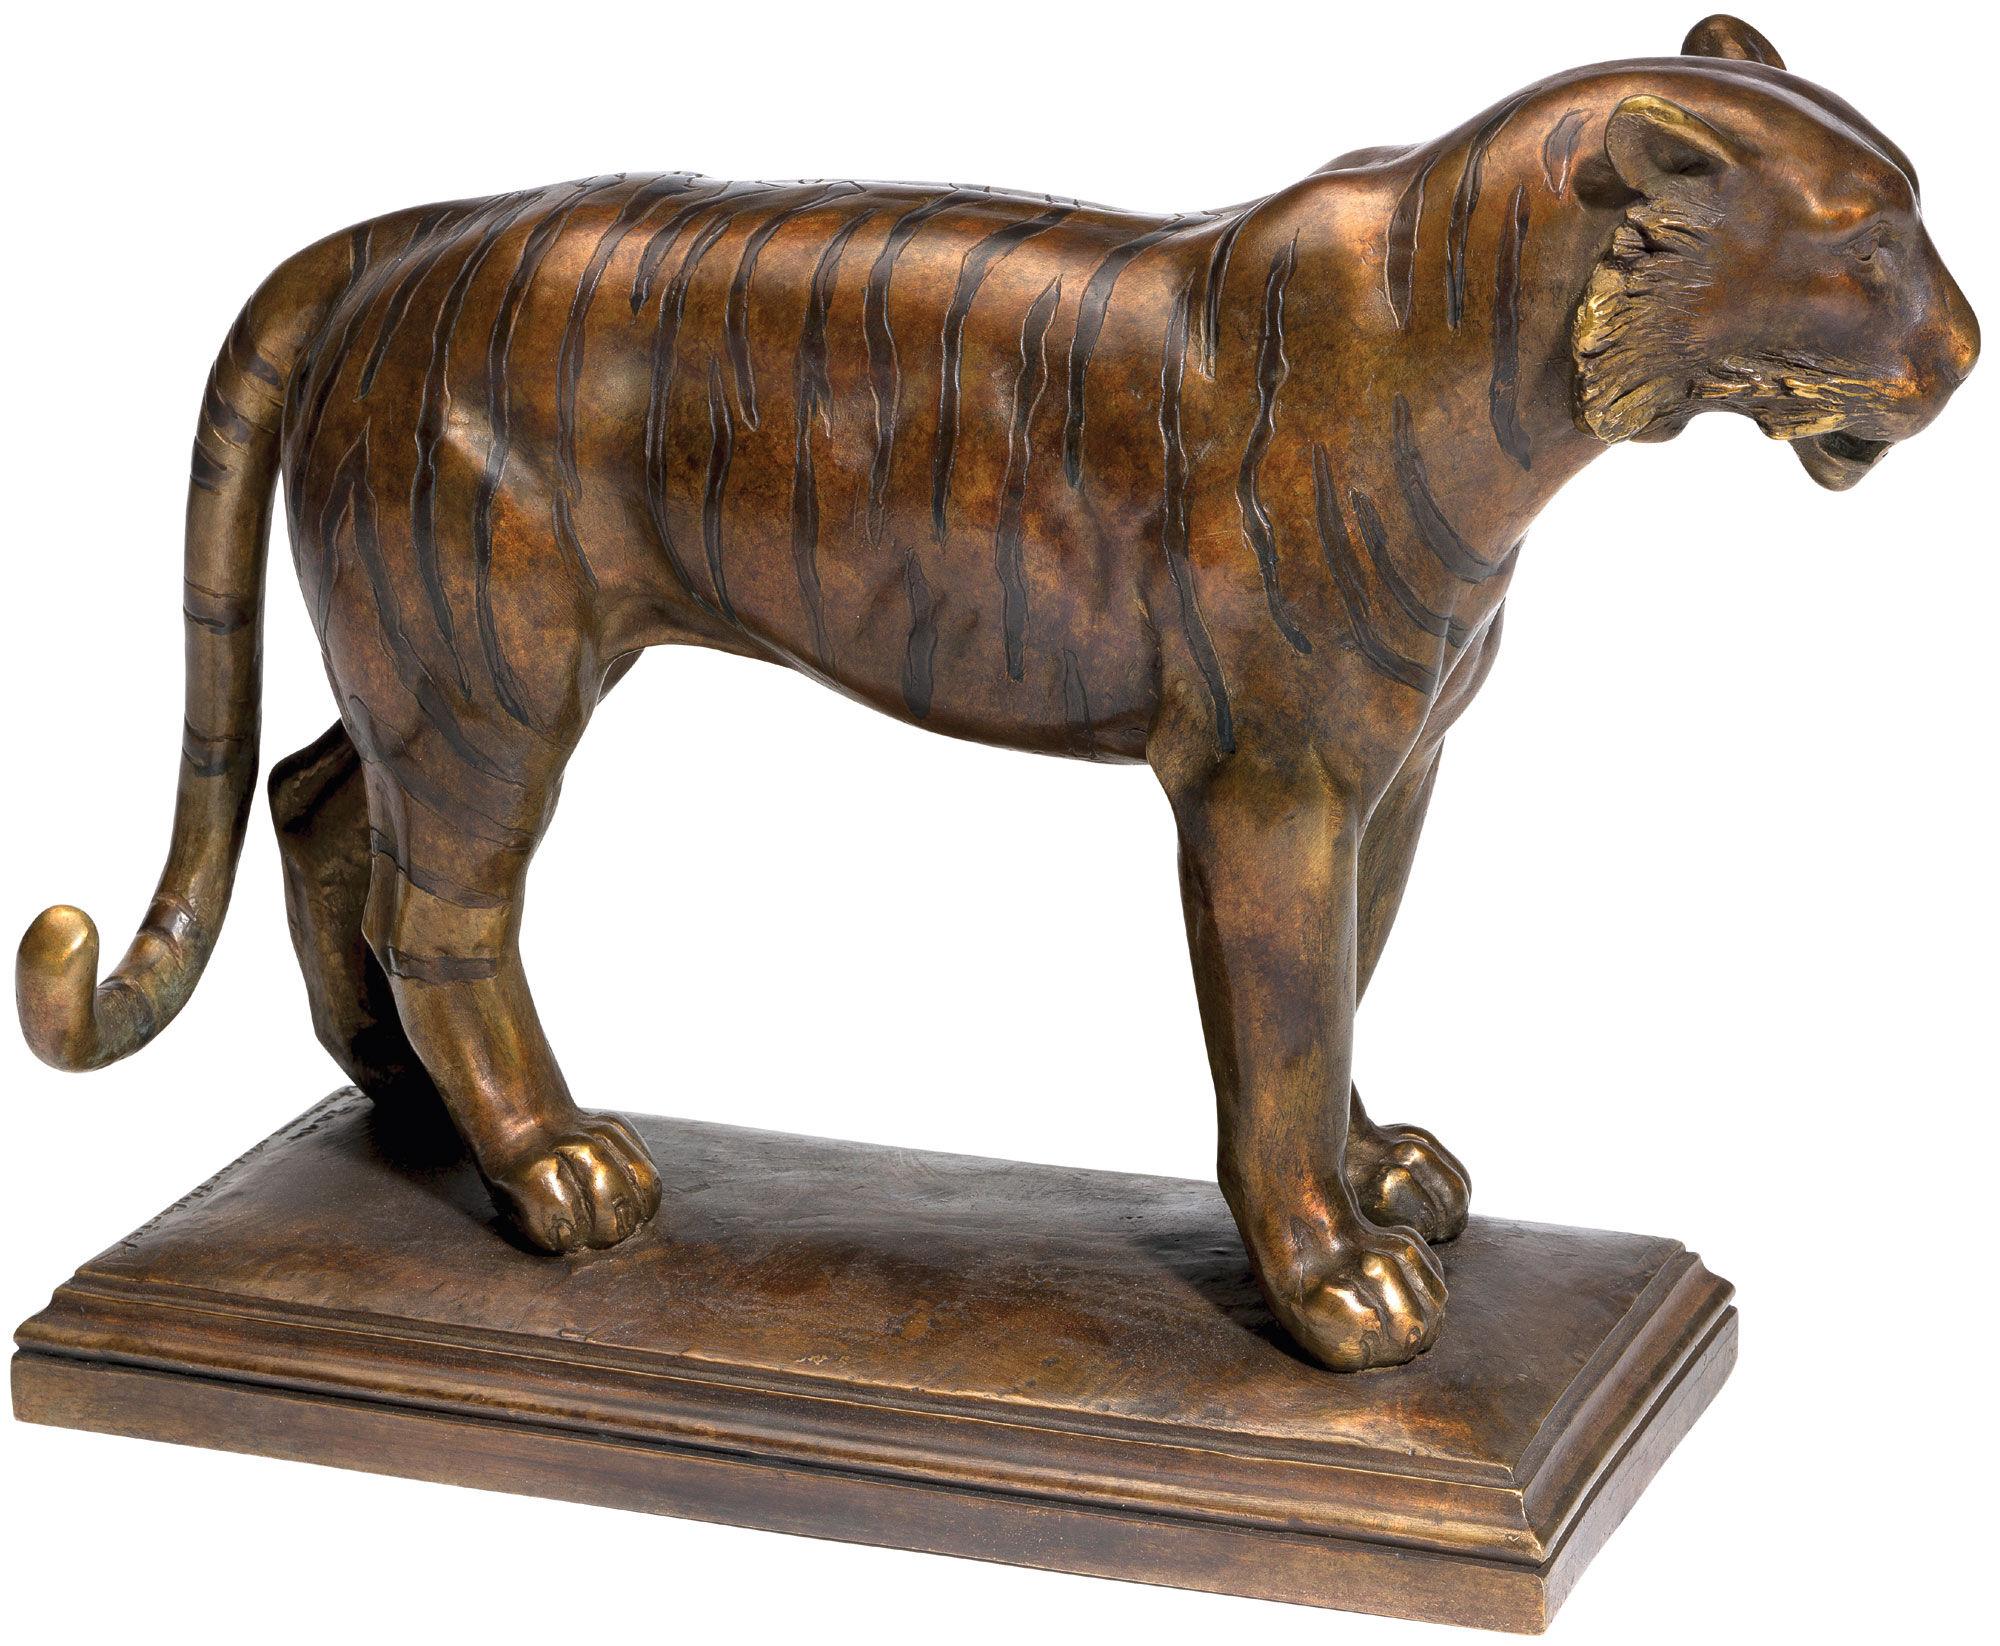 andreas artur hoferick skulptur tiger version in. Black Bedroom Furniture Sets. Home Design Ideas